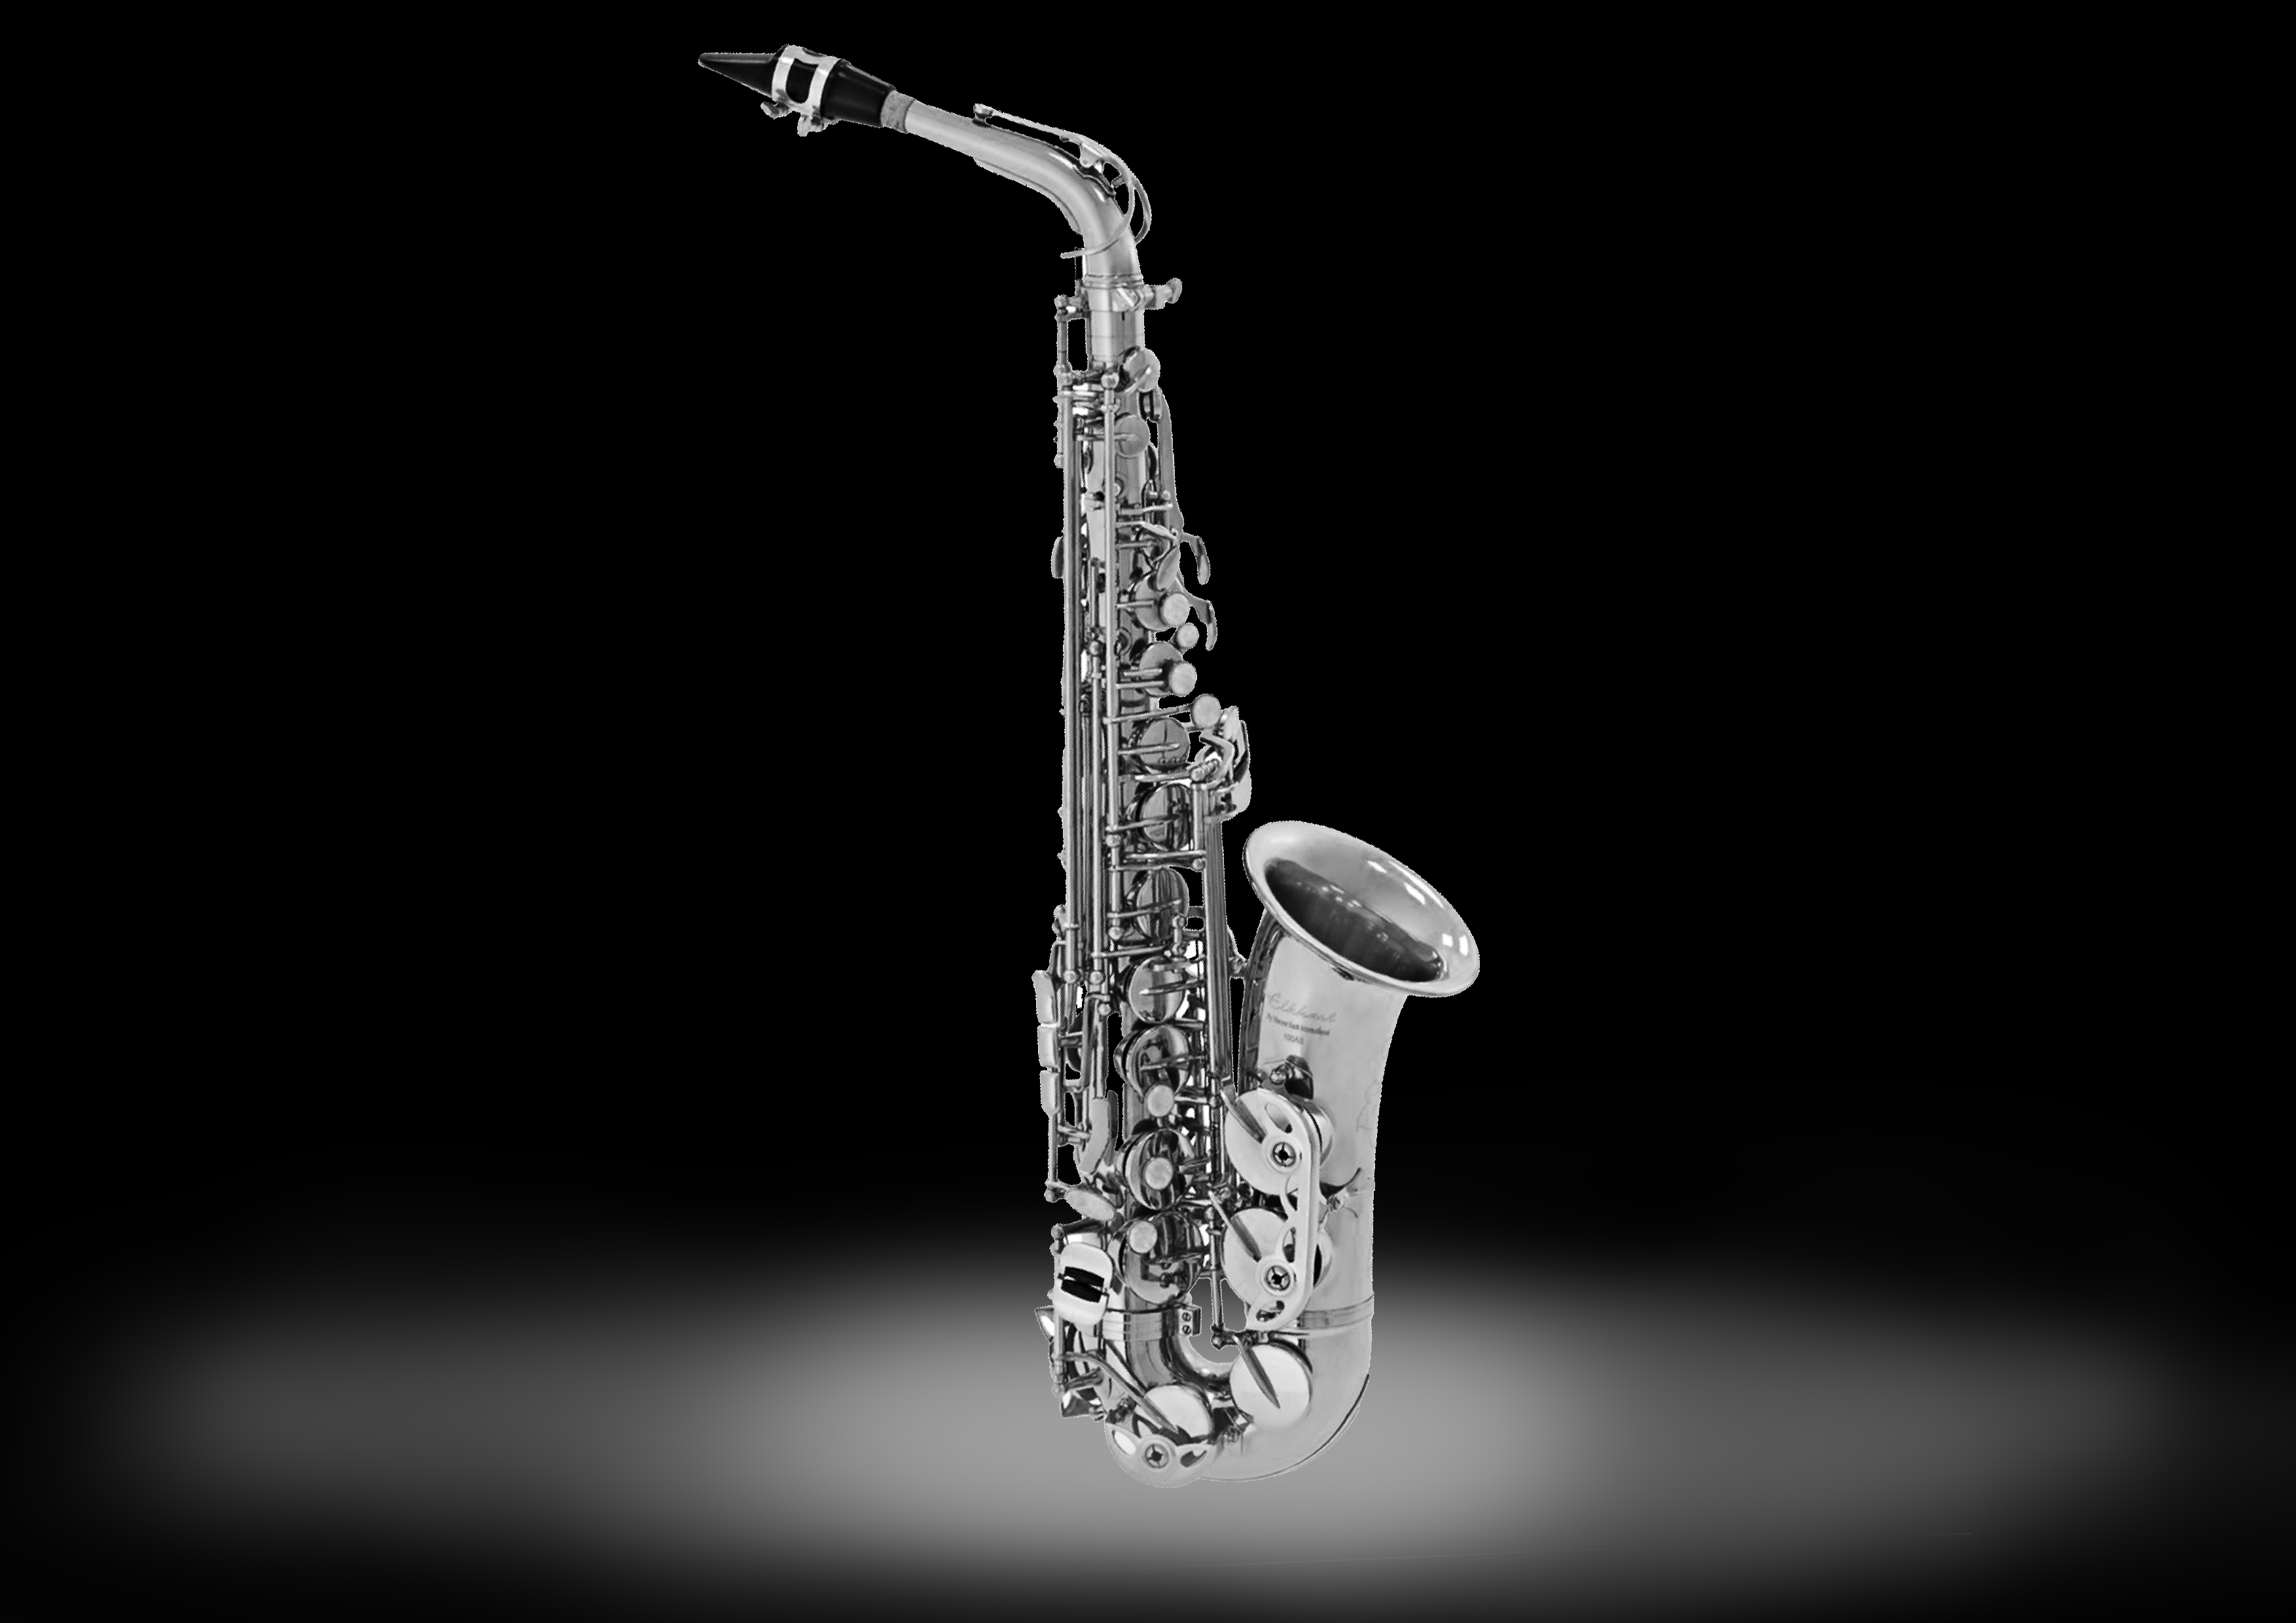 Saxpphone 4